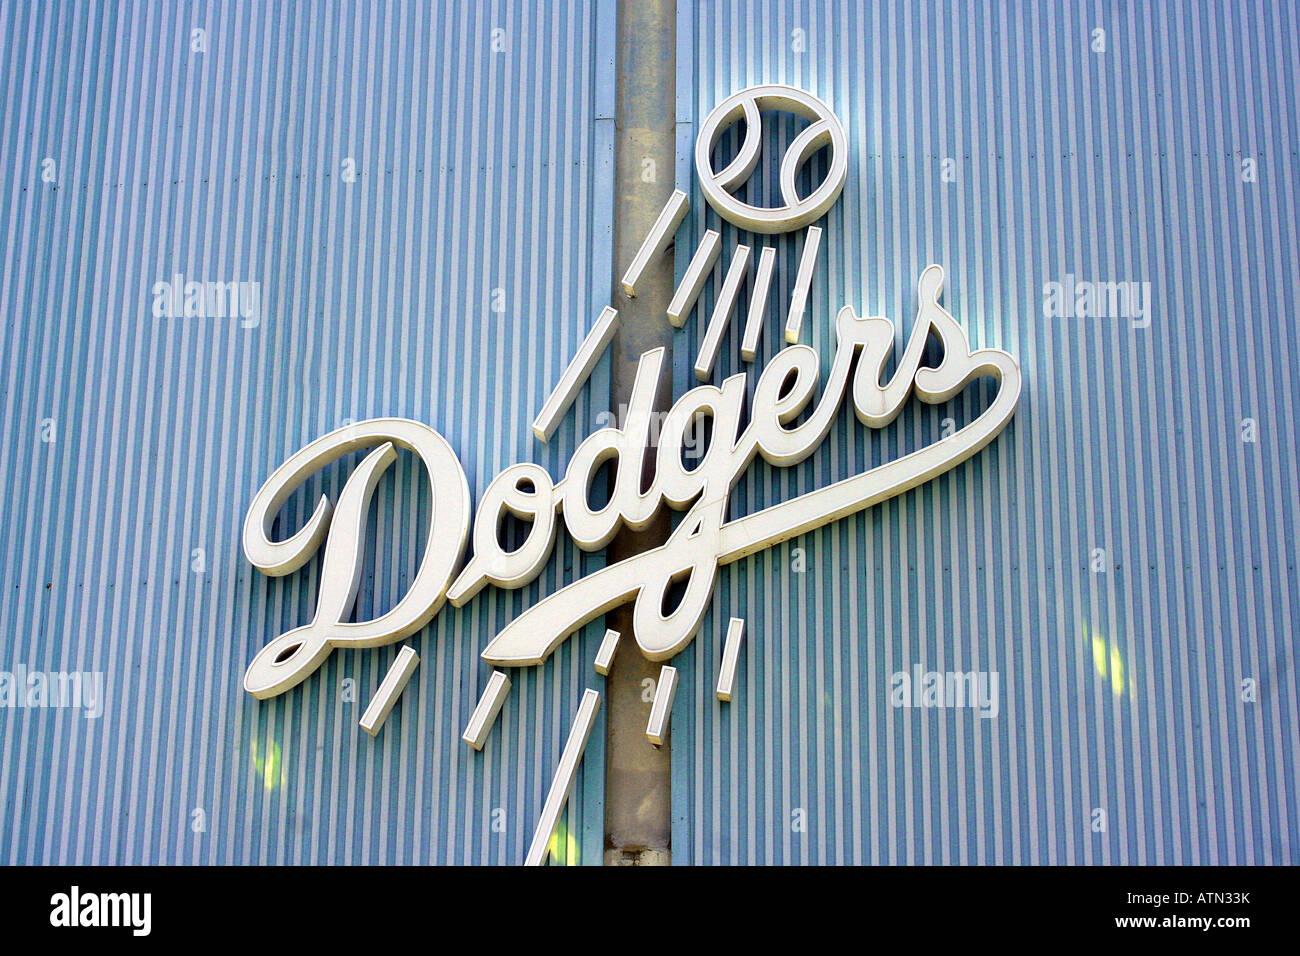 Dodger stadium los angeles california usa 1970 stock photo dodger stadium sign in los angeles california stock photo buycottarizona Image collections